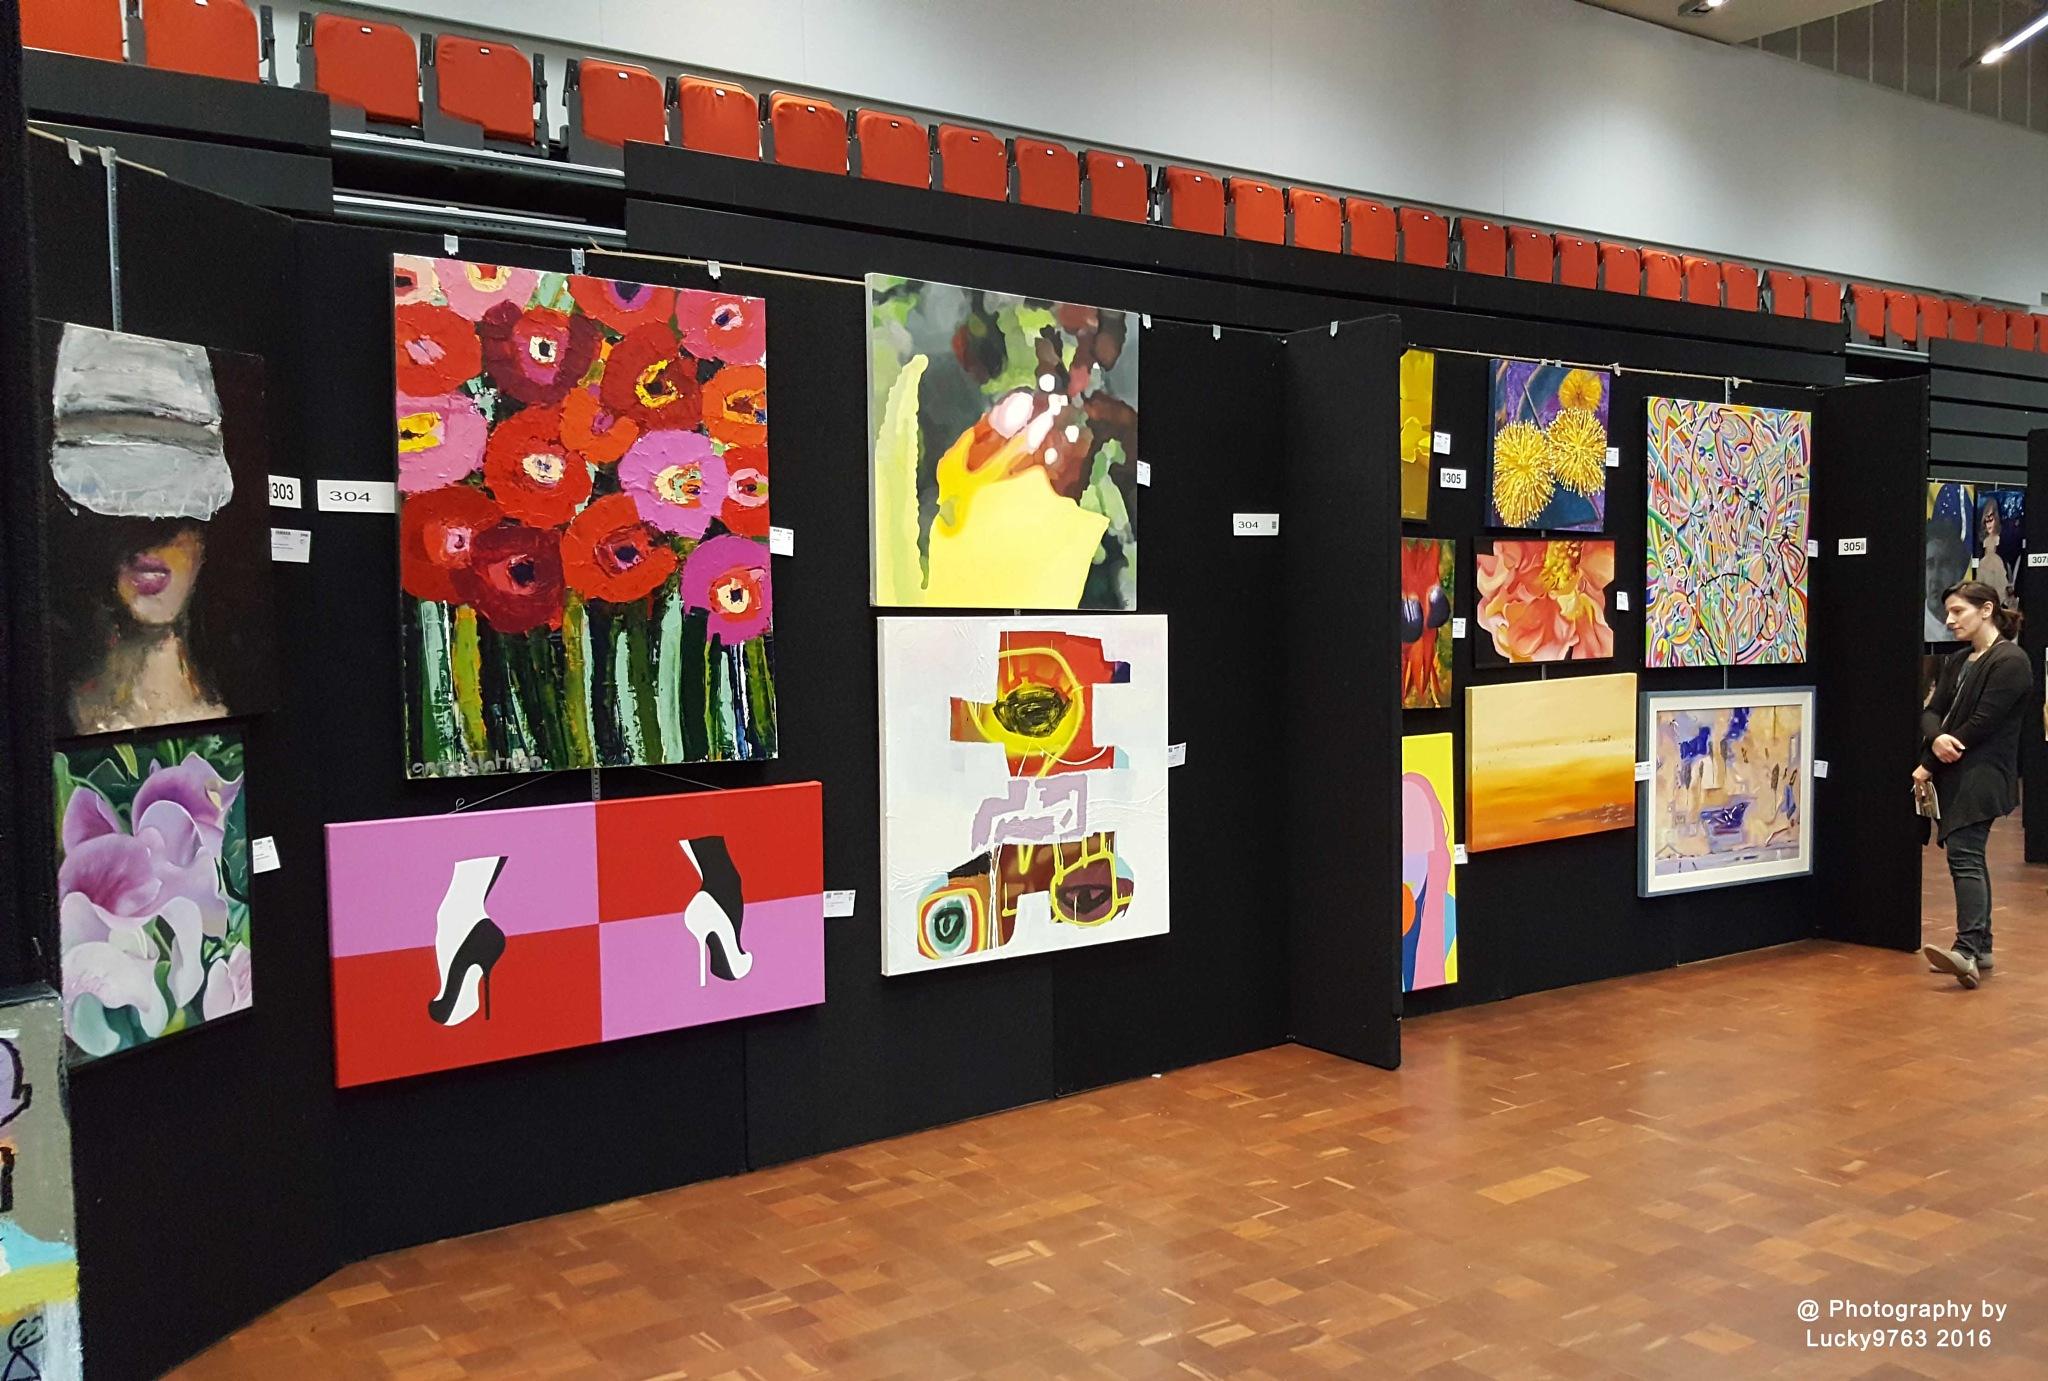 On the Art Show 2016 by Attila Erdei